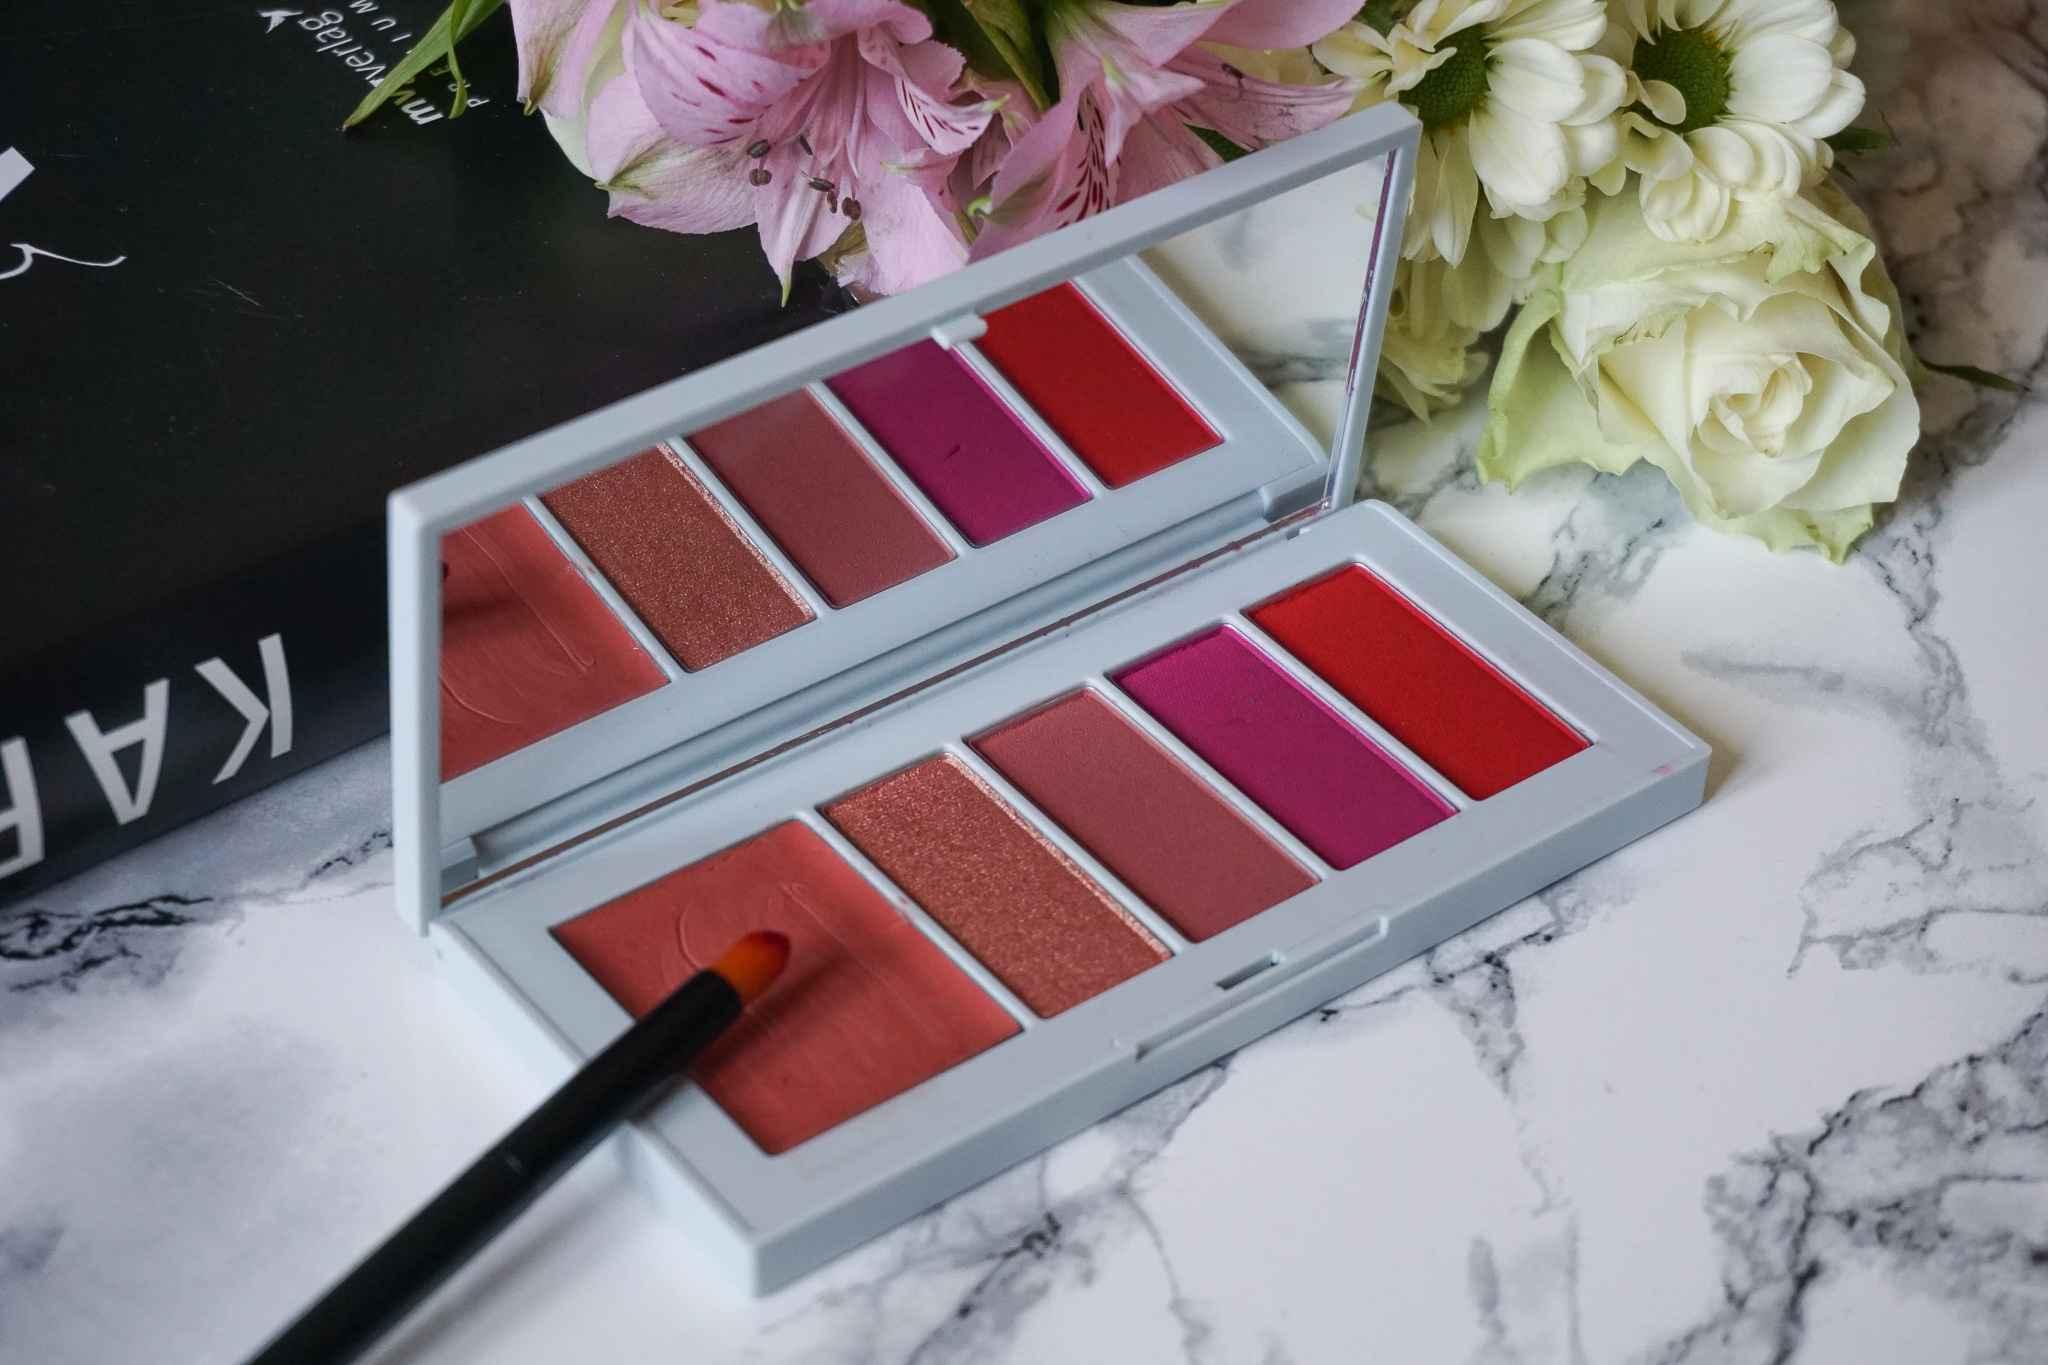 nars x erdem poison rose lip powder palette